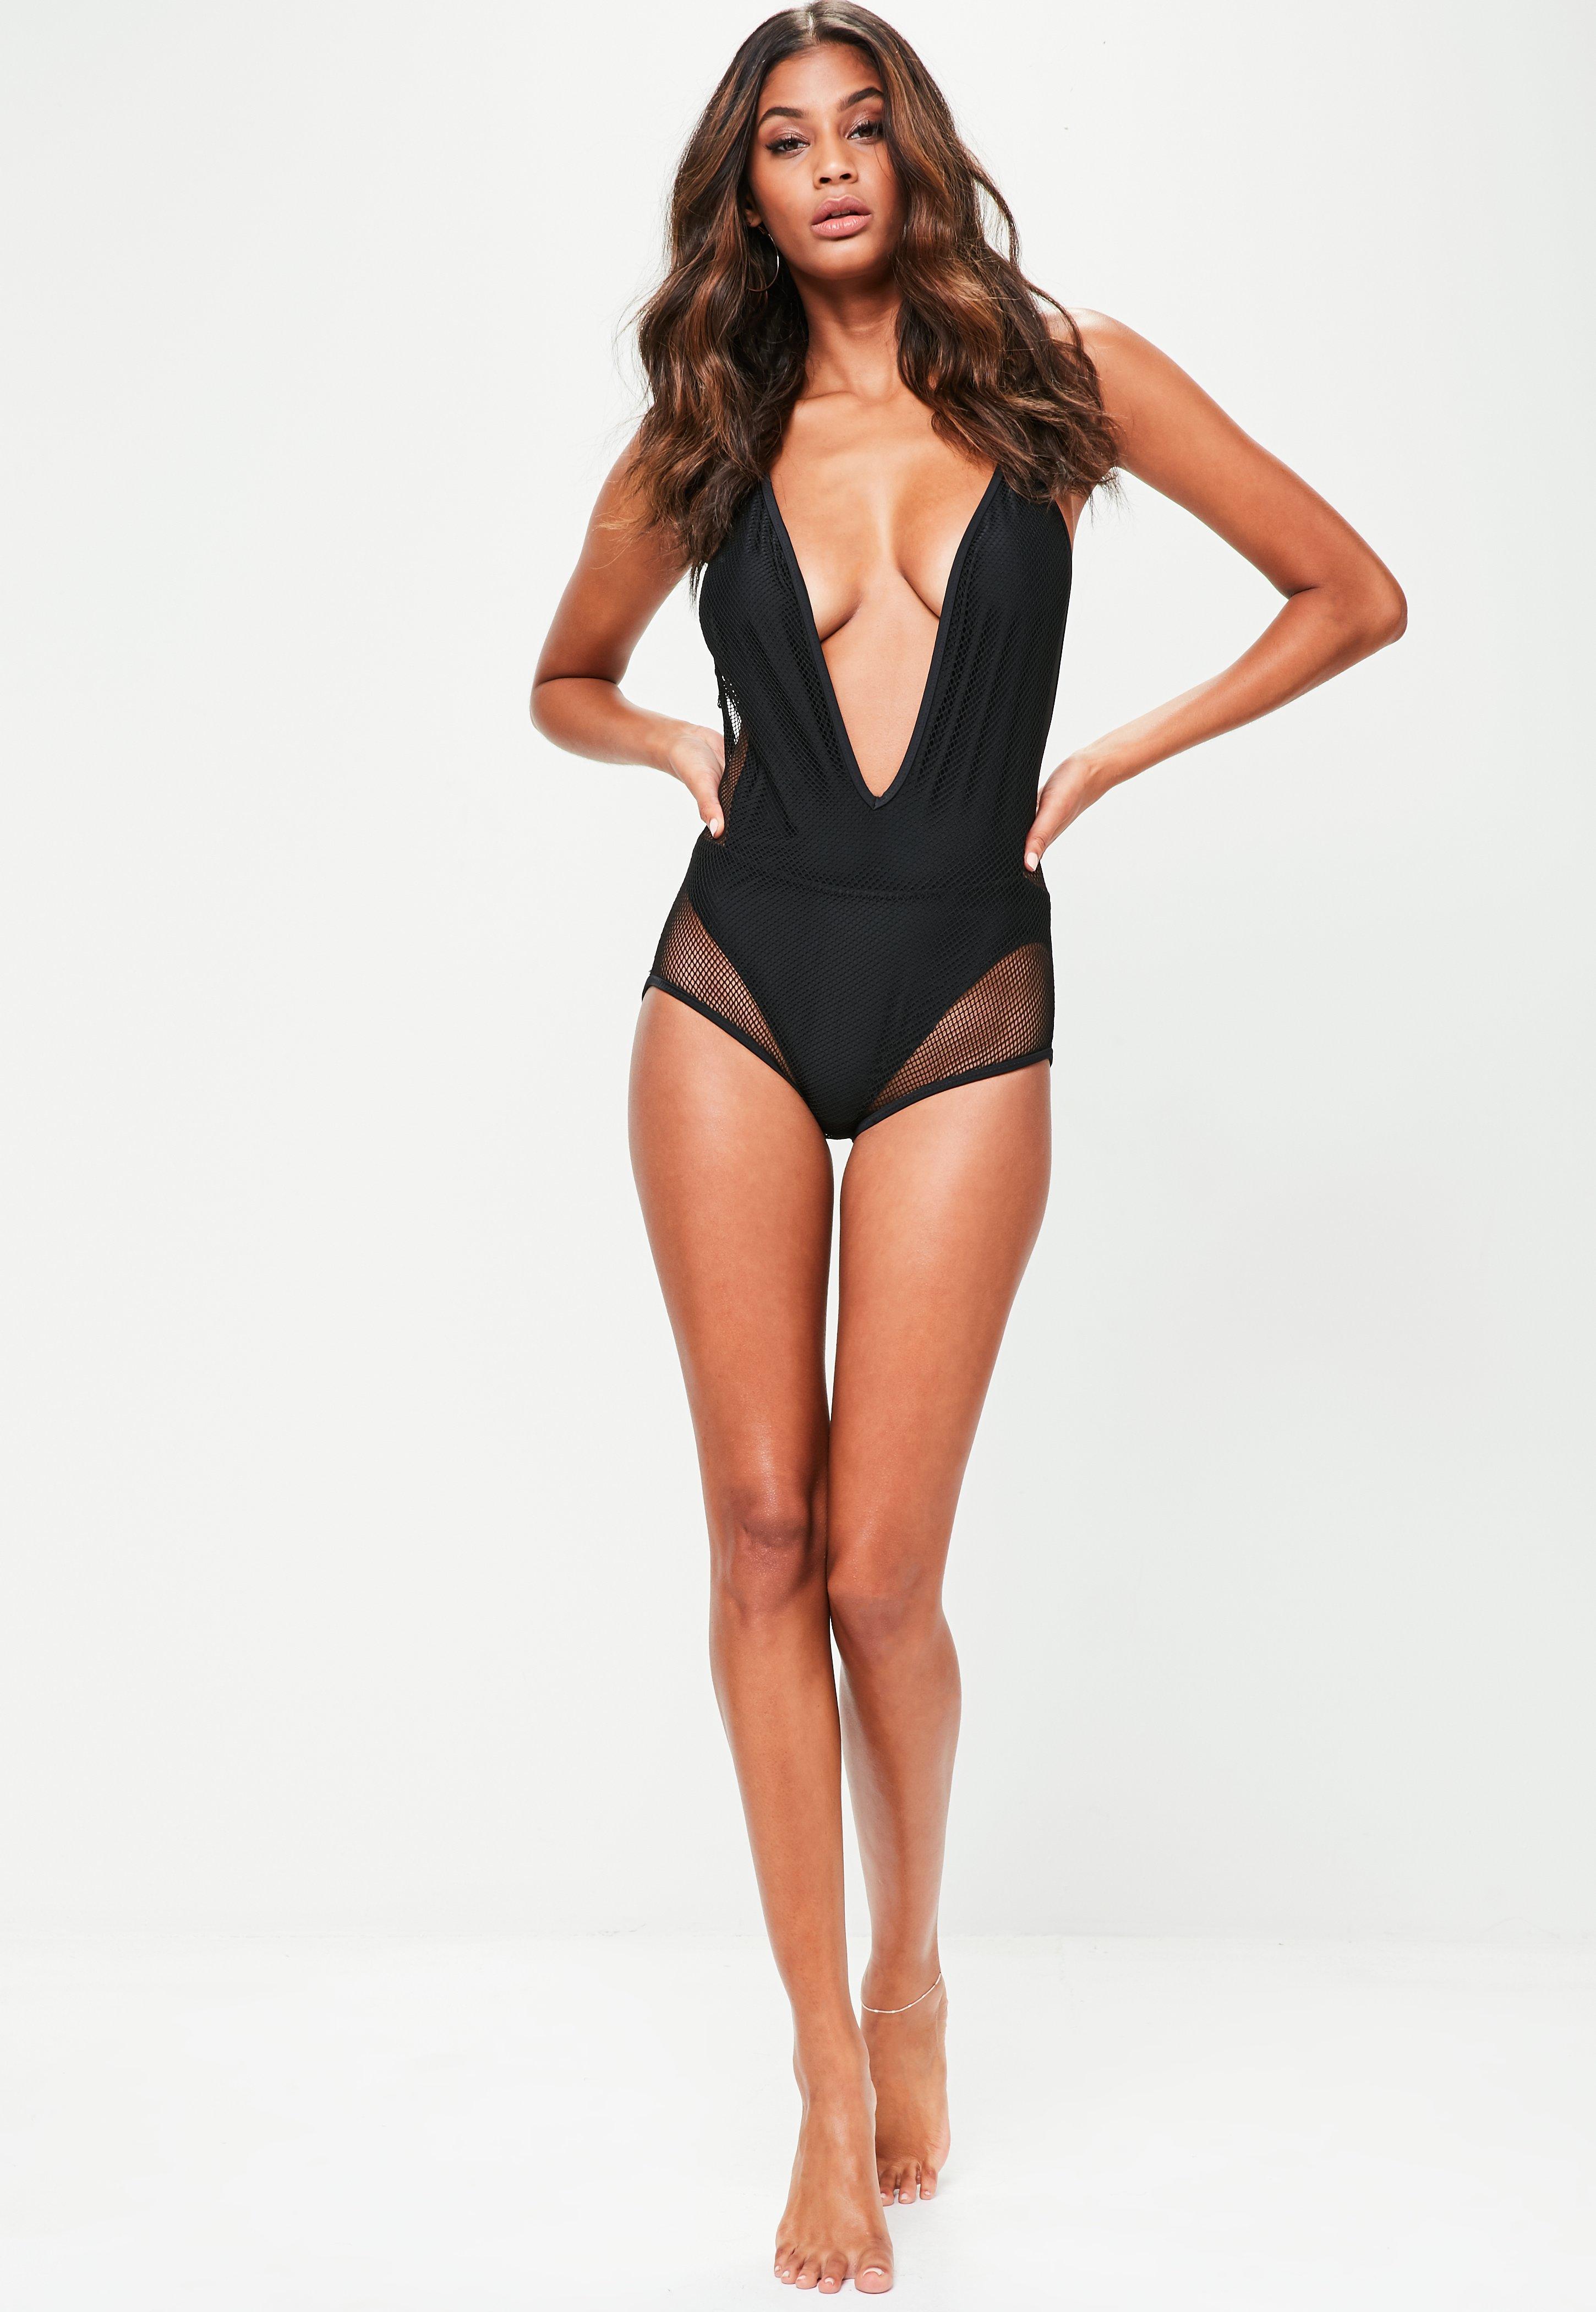 4763b97e52378 Lyst - Missguided Black Fishnet Plunge Swimsuit in Black